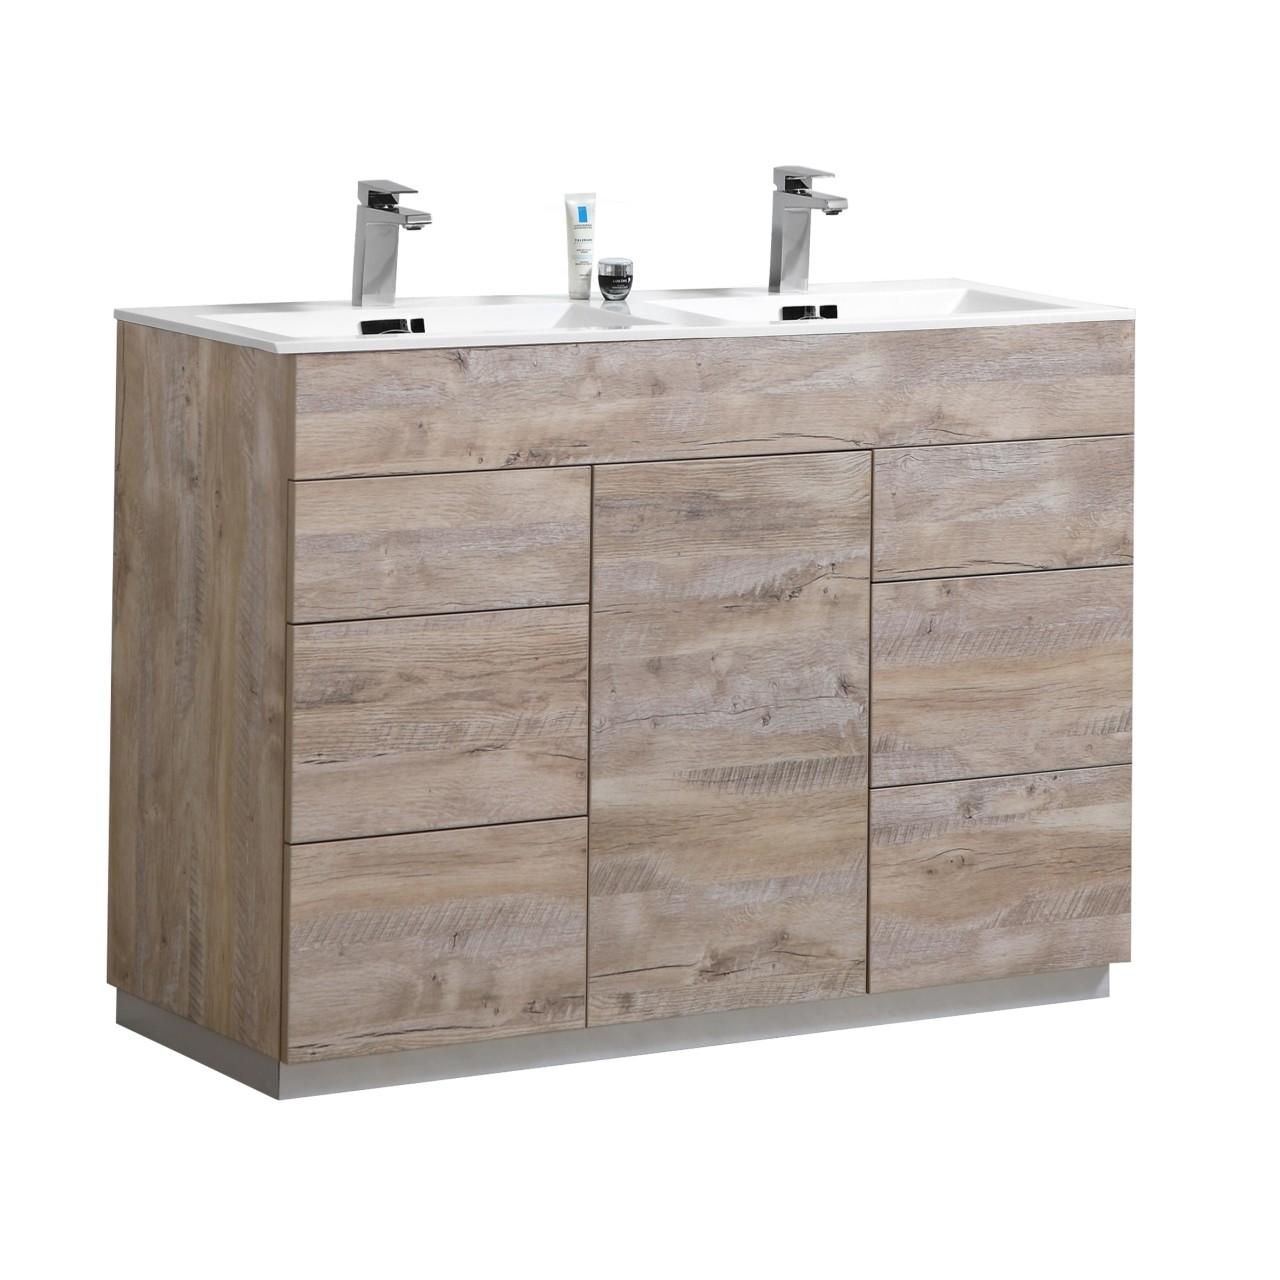 Kubebath Kfm48d Nw Milano 48 Inch Double Sink Nature Wood Modern Bathroom Vanity Kfm48d Nw Kfm48dnw